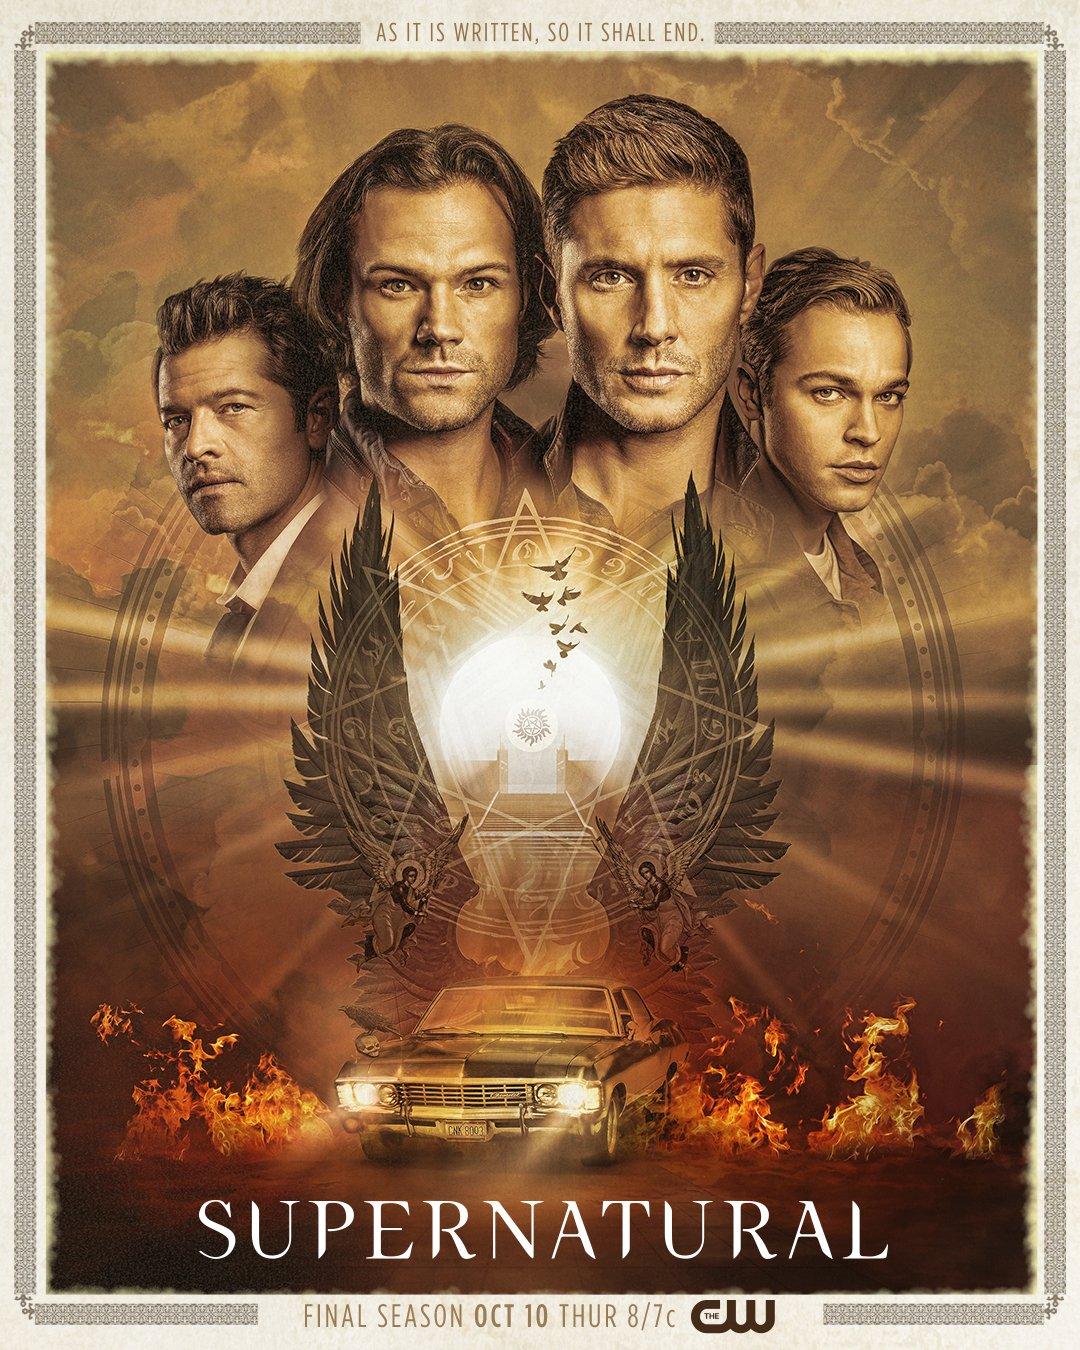 Supernatural - Season 15 - Promotional Poster